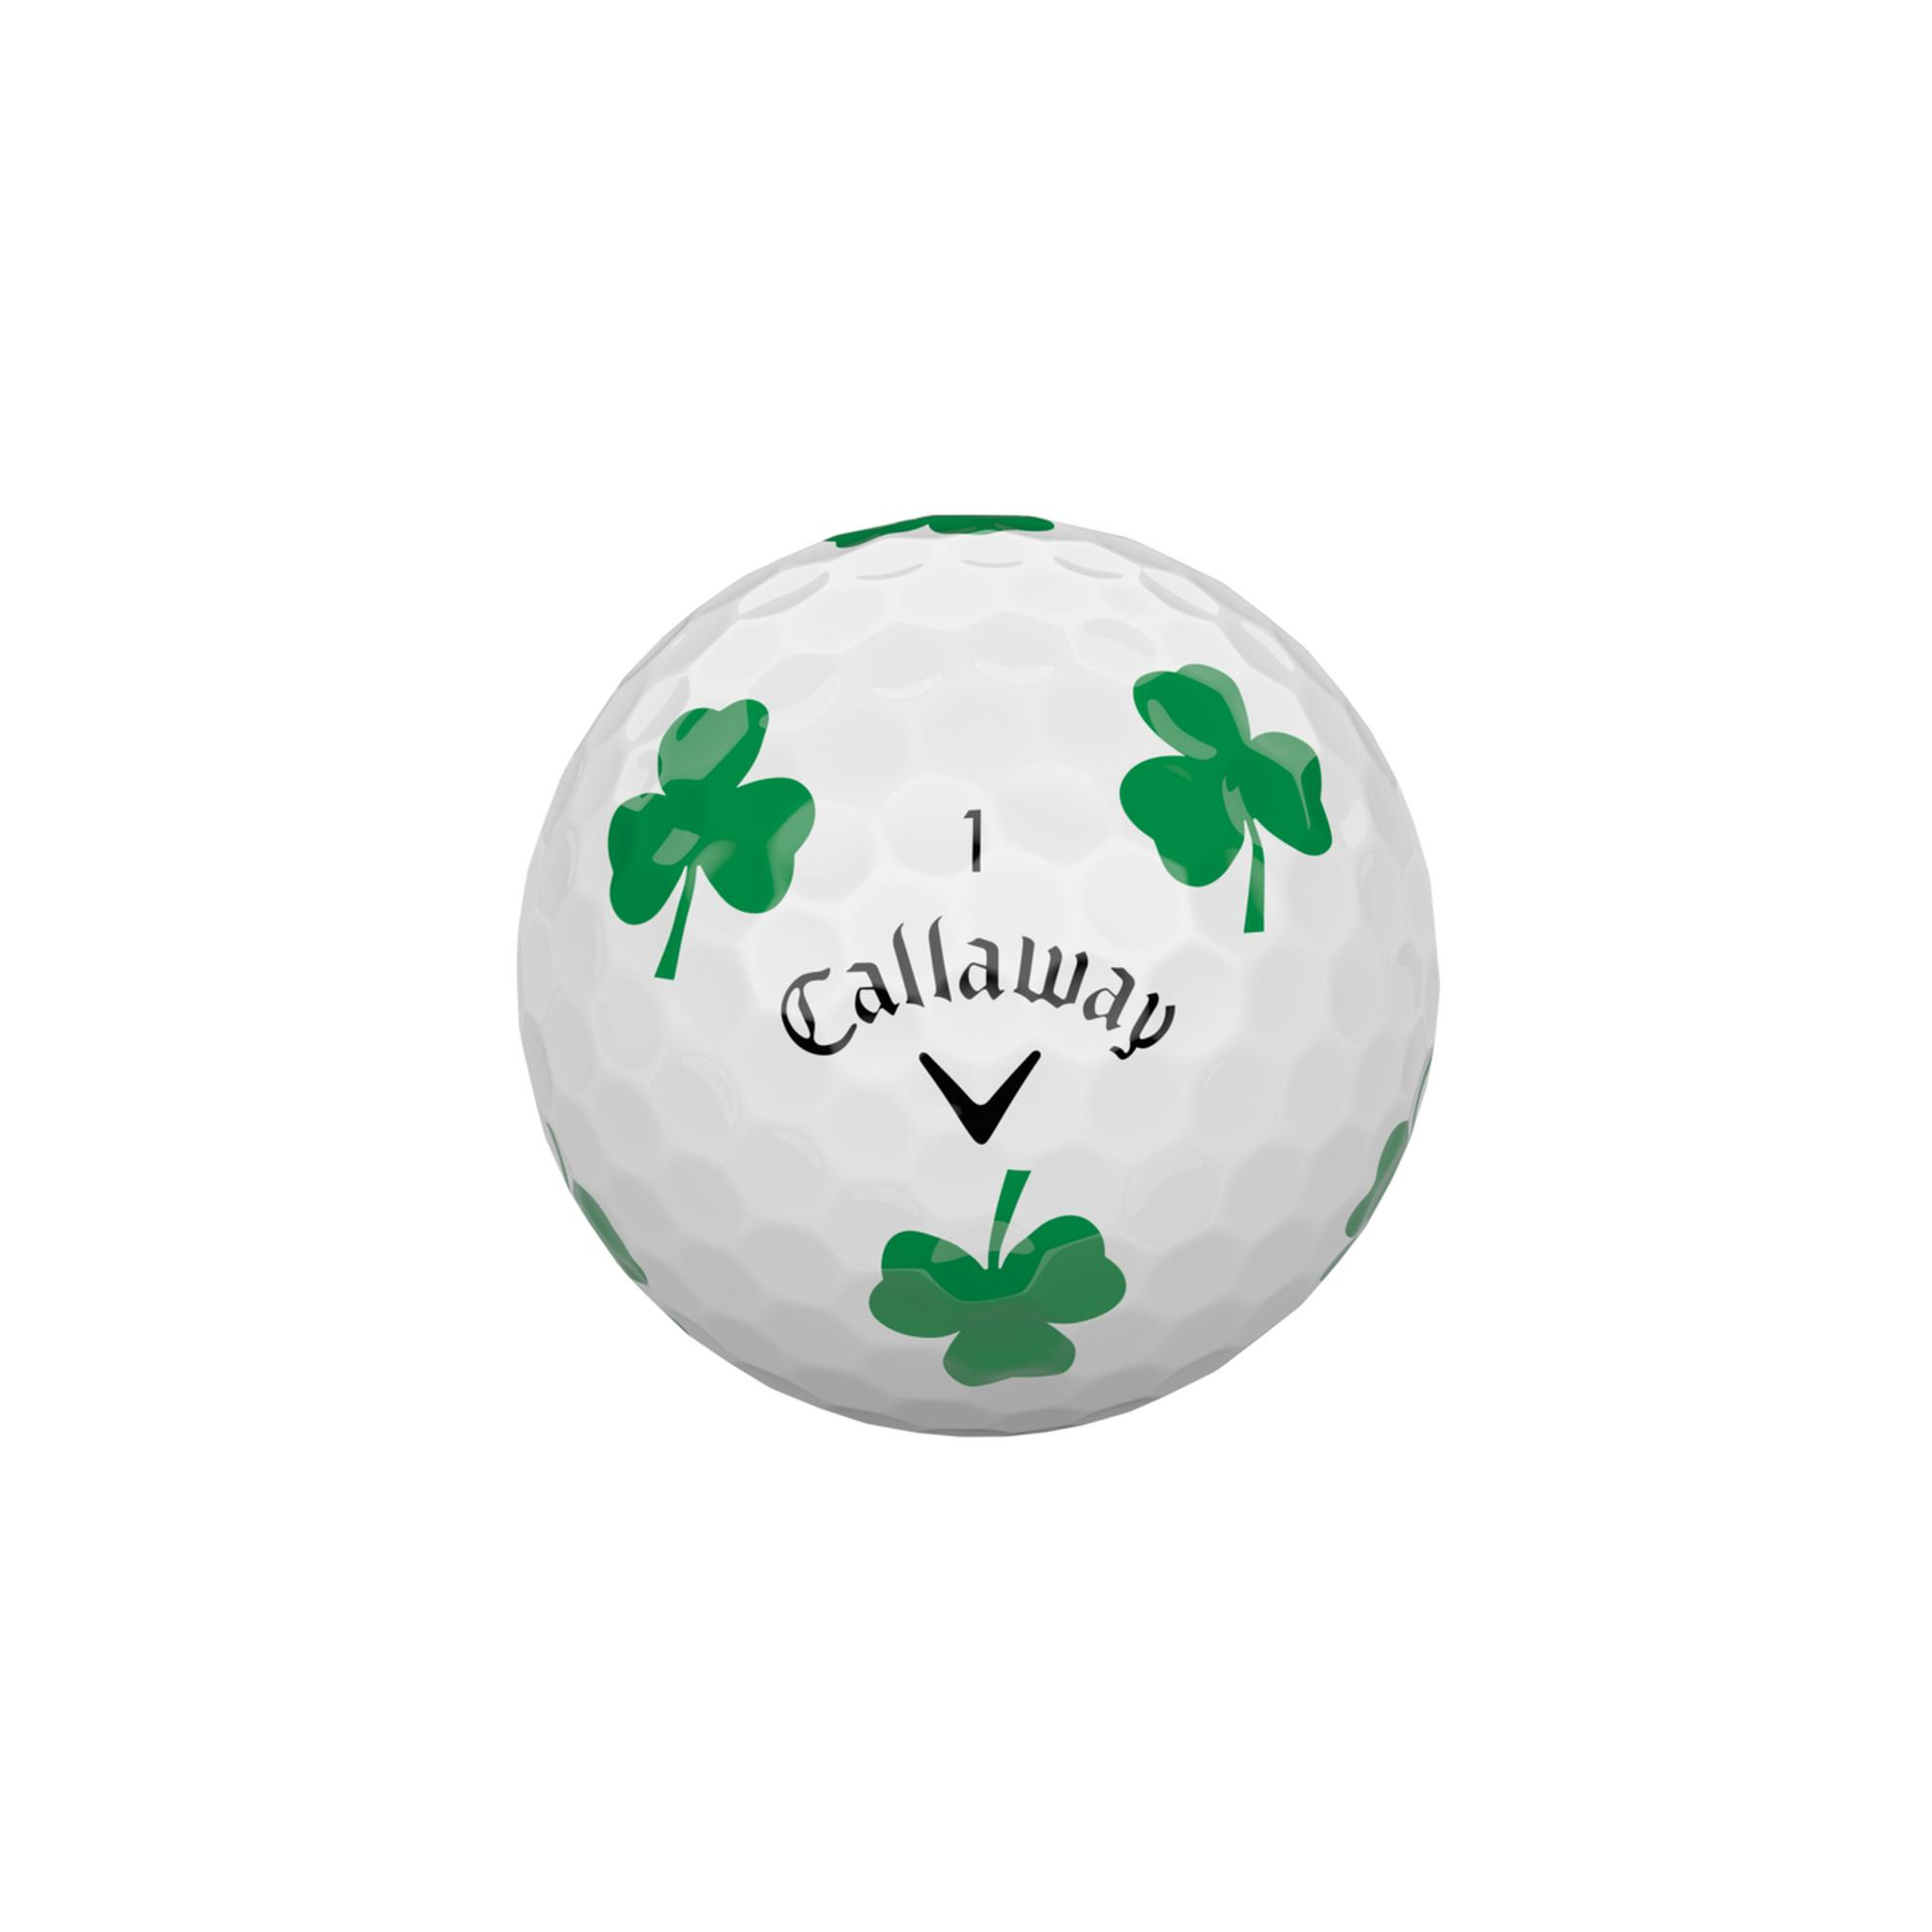 Chrome Soft Truvis Golf Balls - Clover Edition